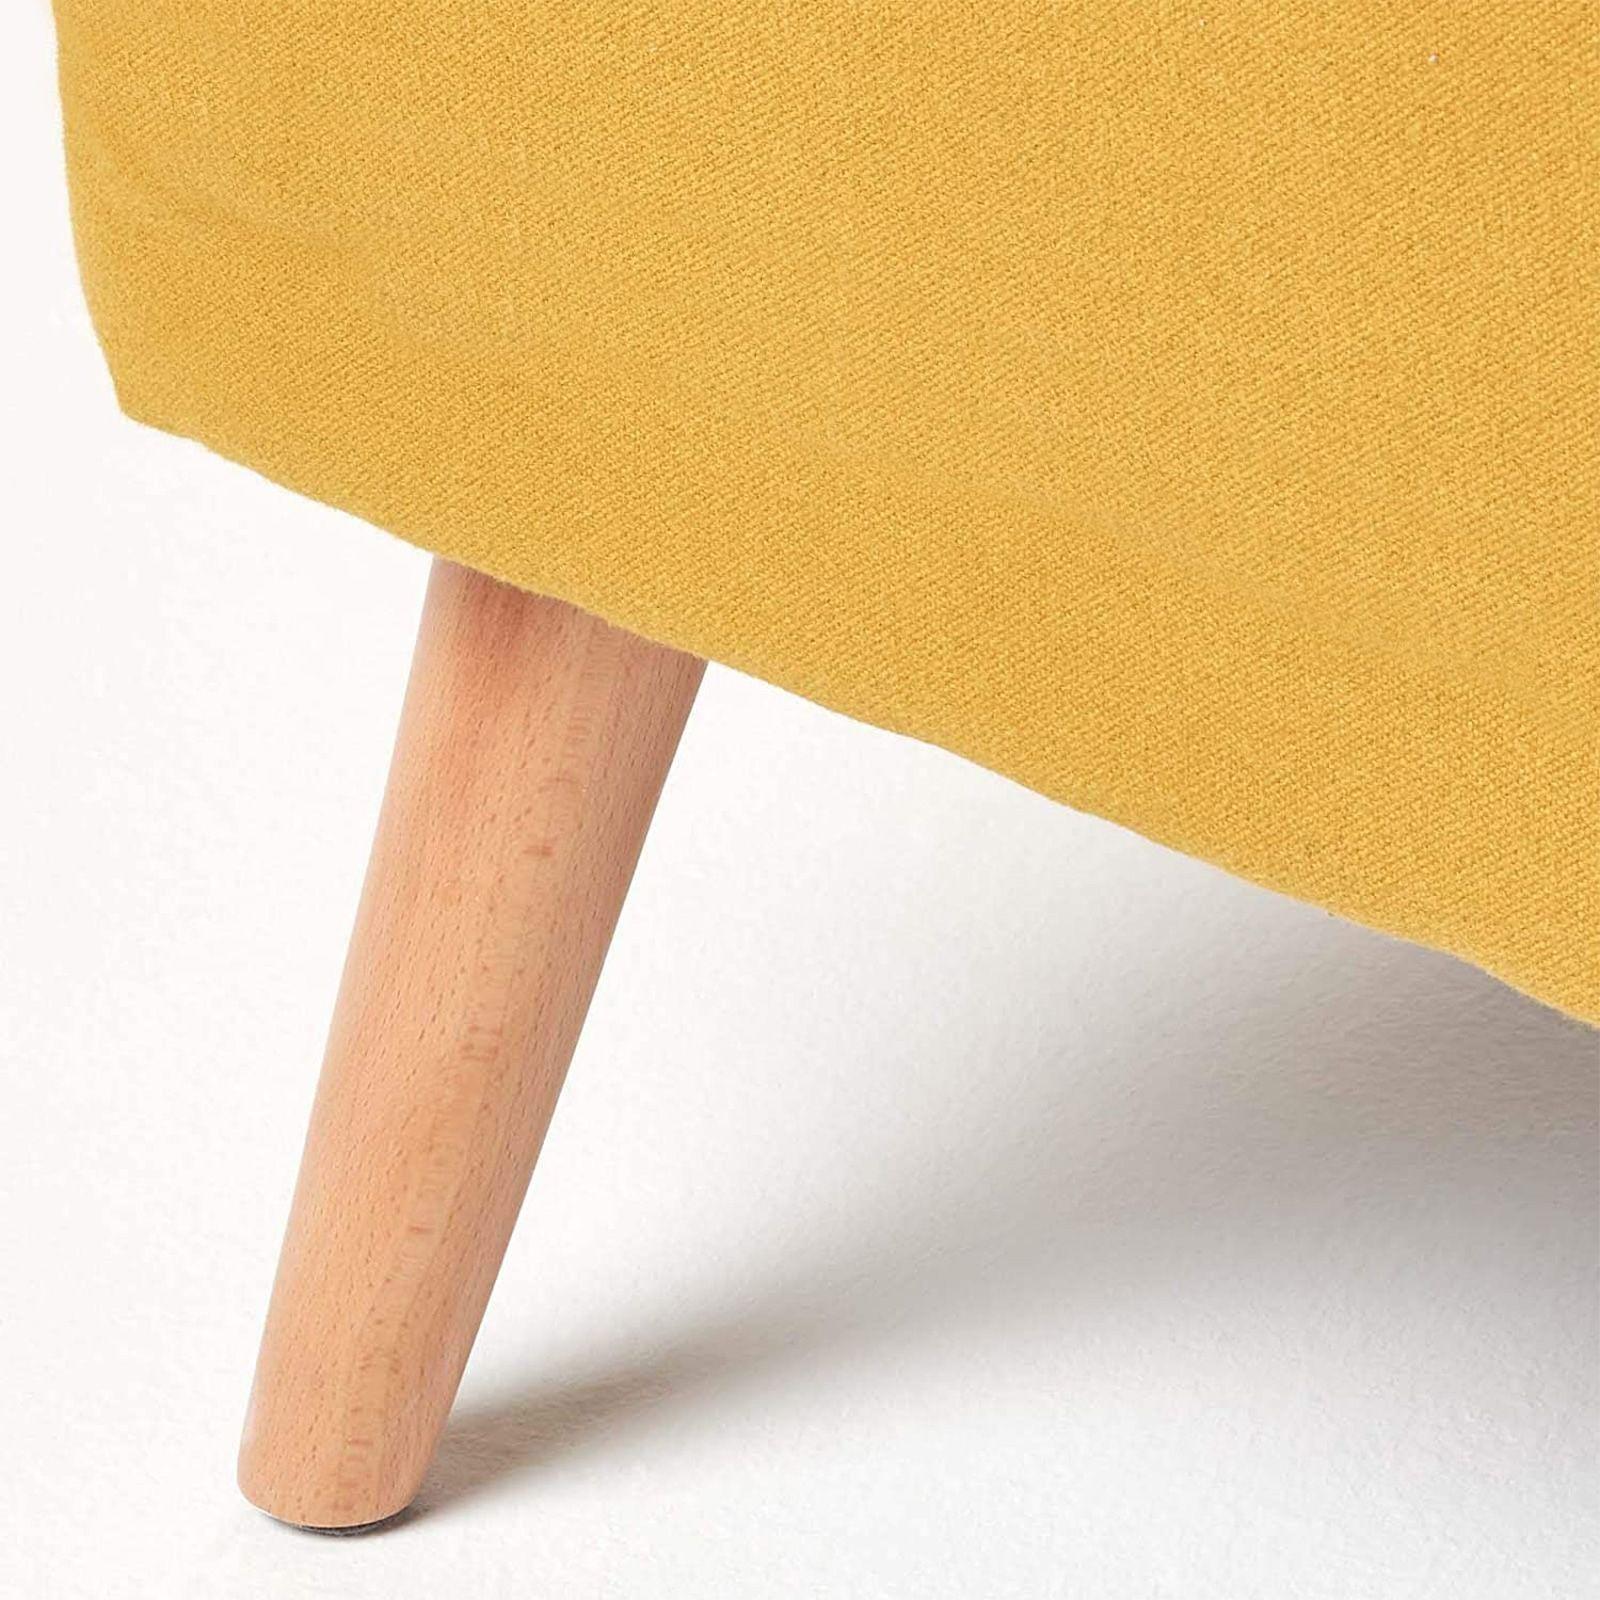 DILVAN | Sillón tapizado mostaza (72 x 76 x 77 cm)